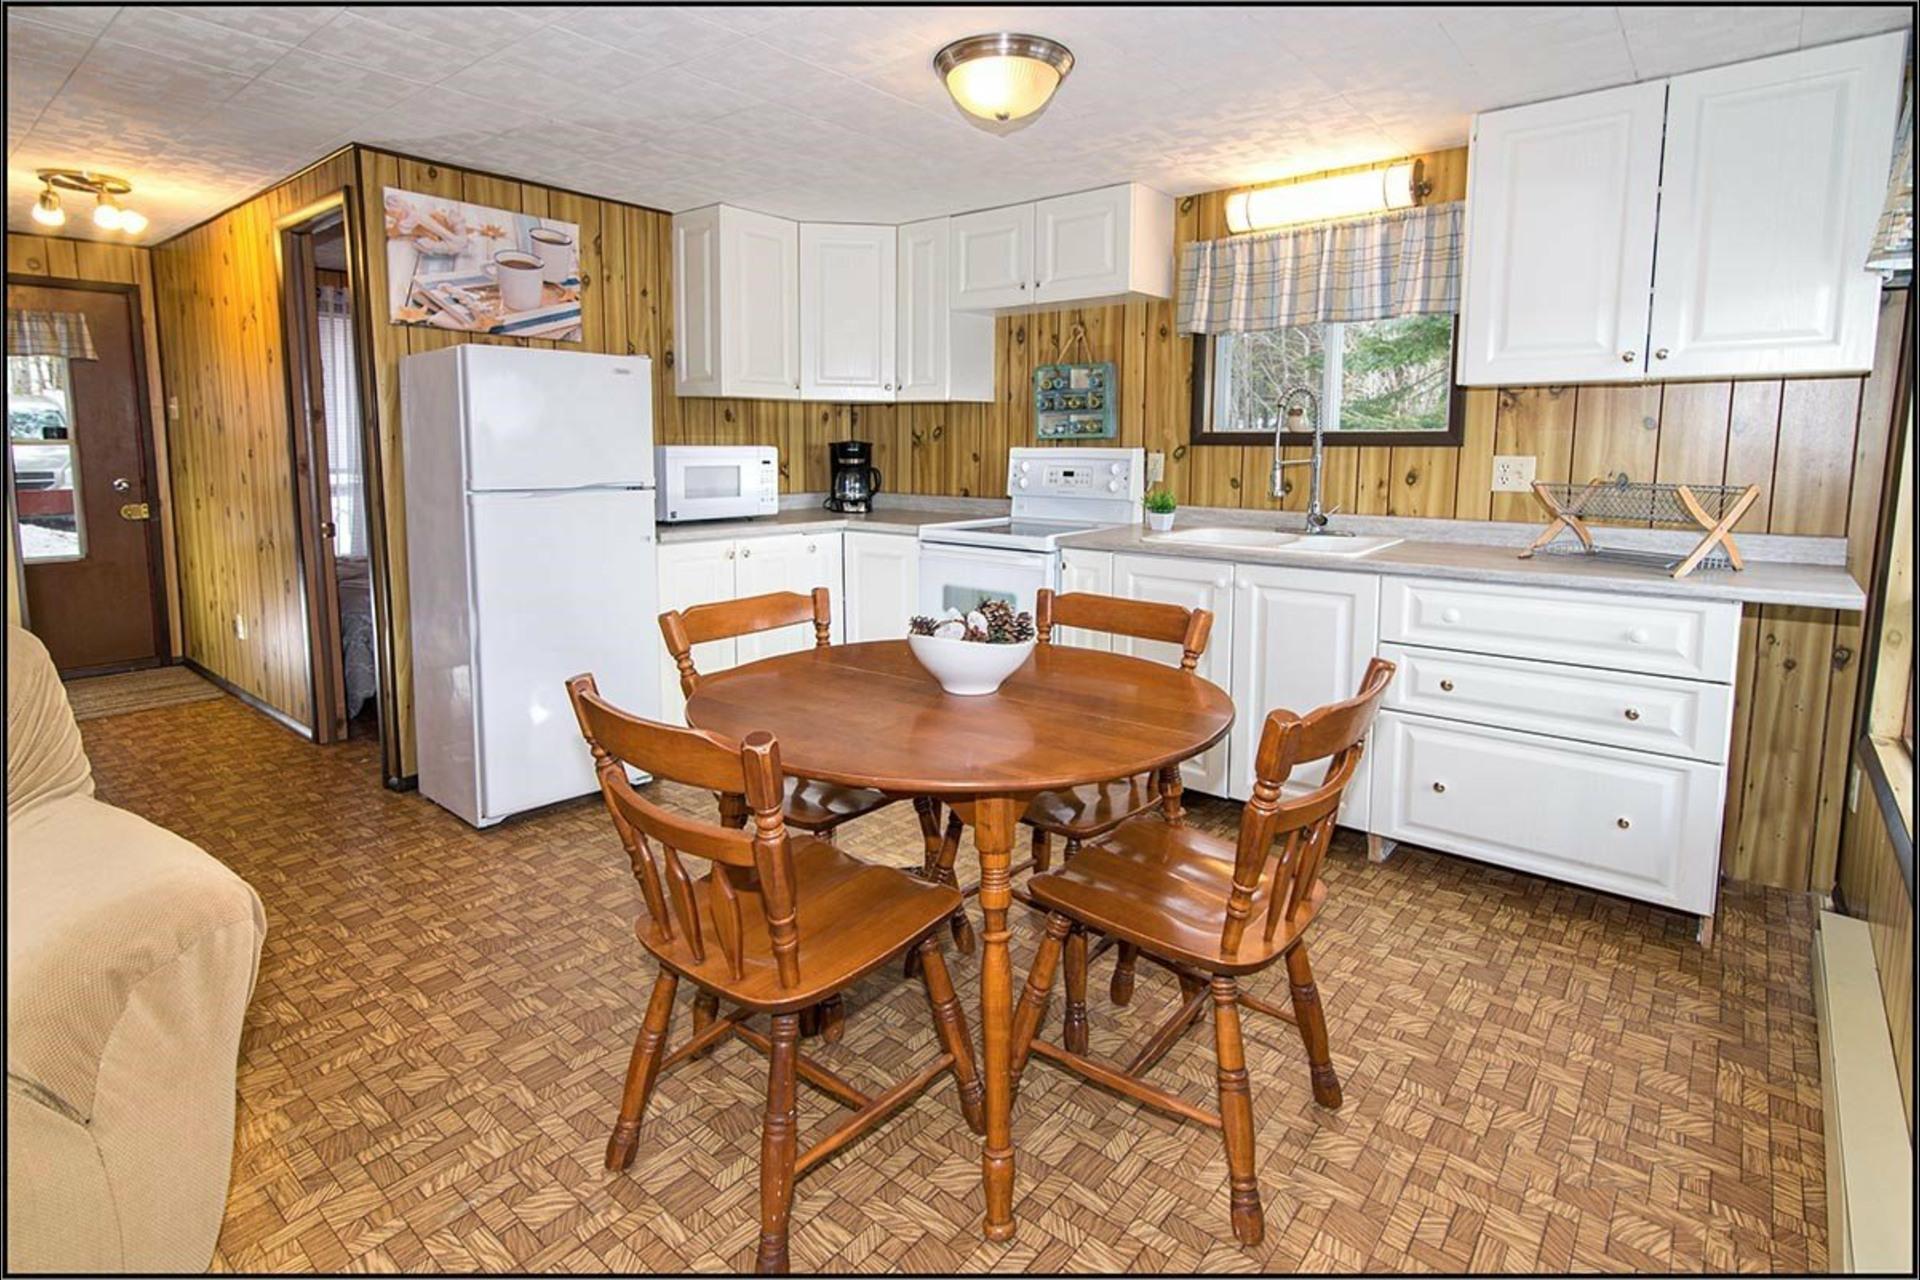 image 1 - House For sale Saint-Aubert - 6 rooms